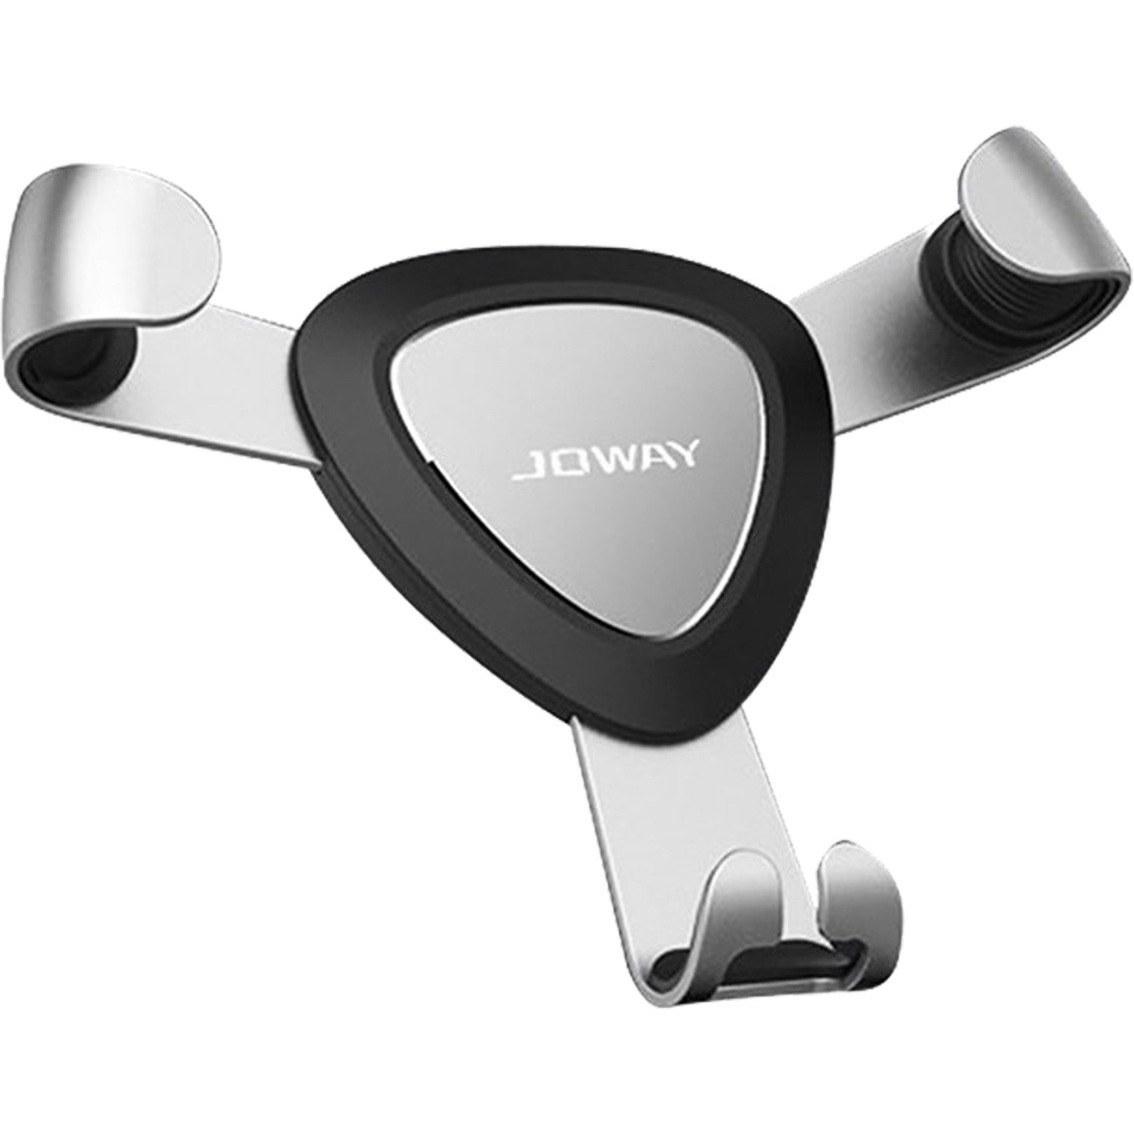 پایه نگه دارنده موبایل جووی Joway Zj08 Phone Holder